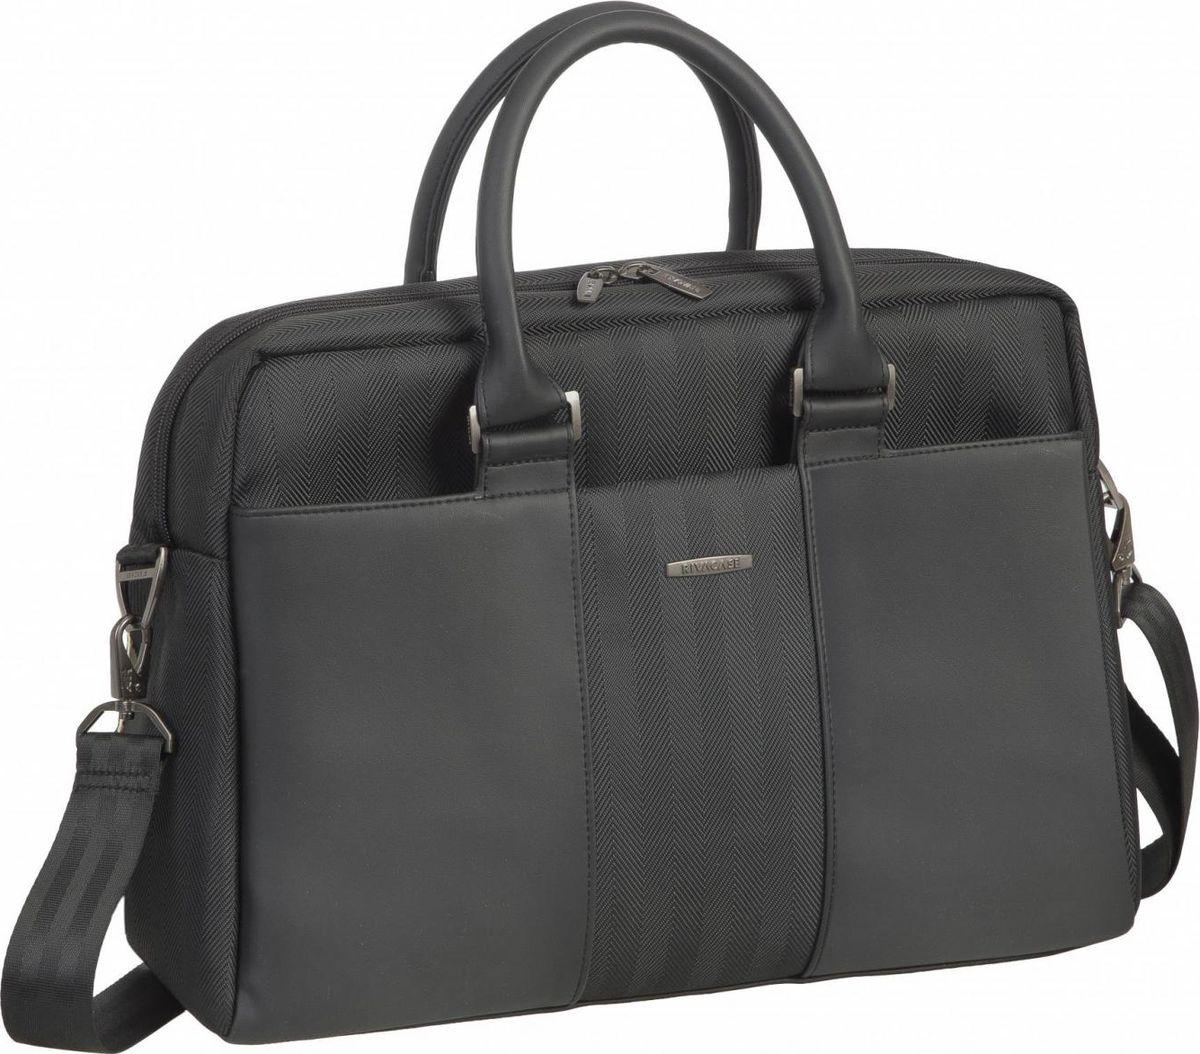 все цены на RivaCase 8121, Black сумка для ноутбука 14